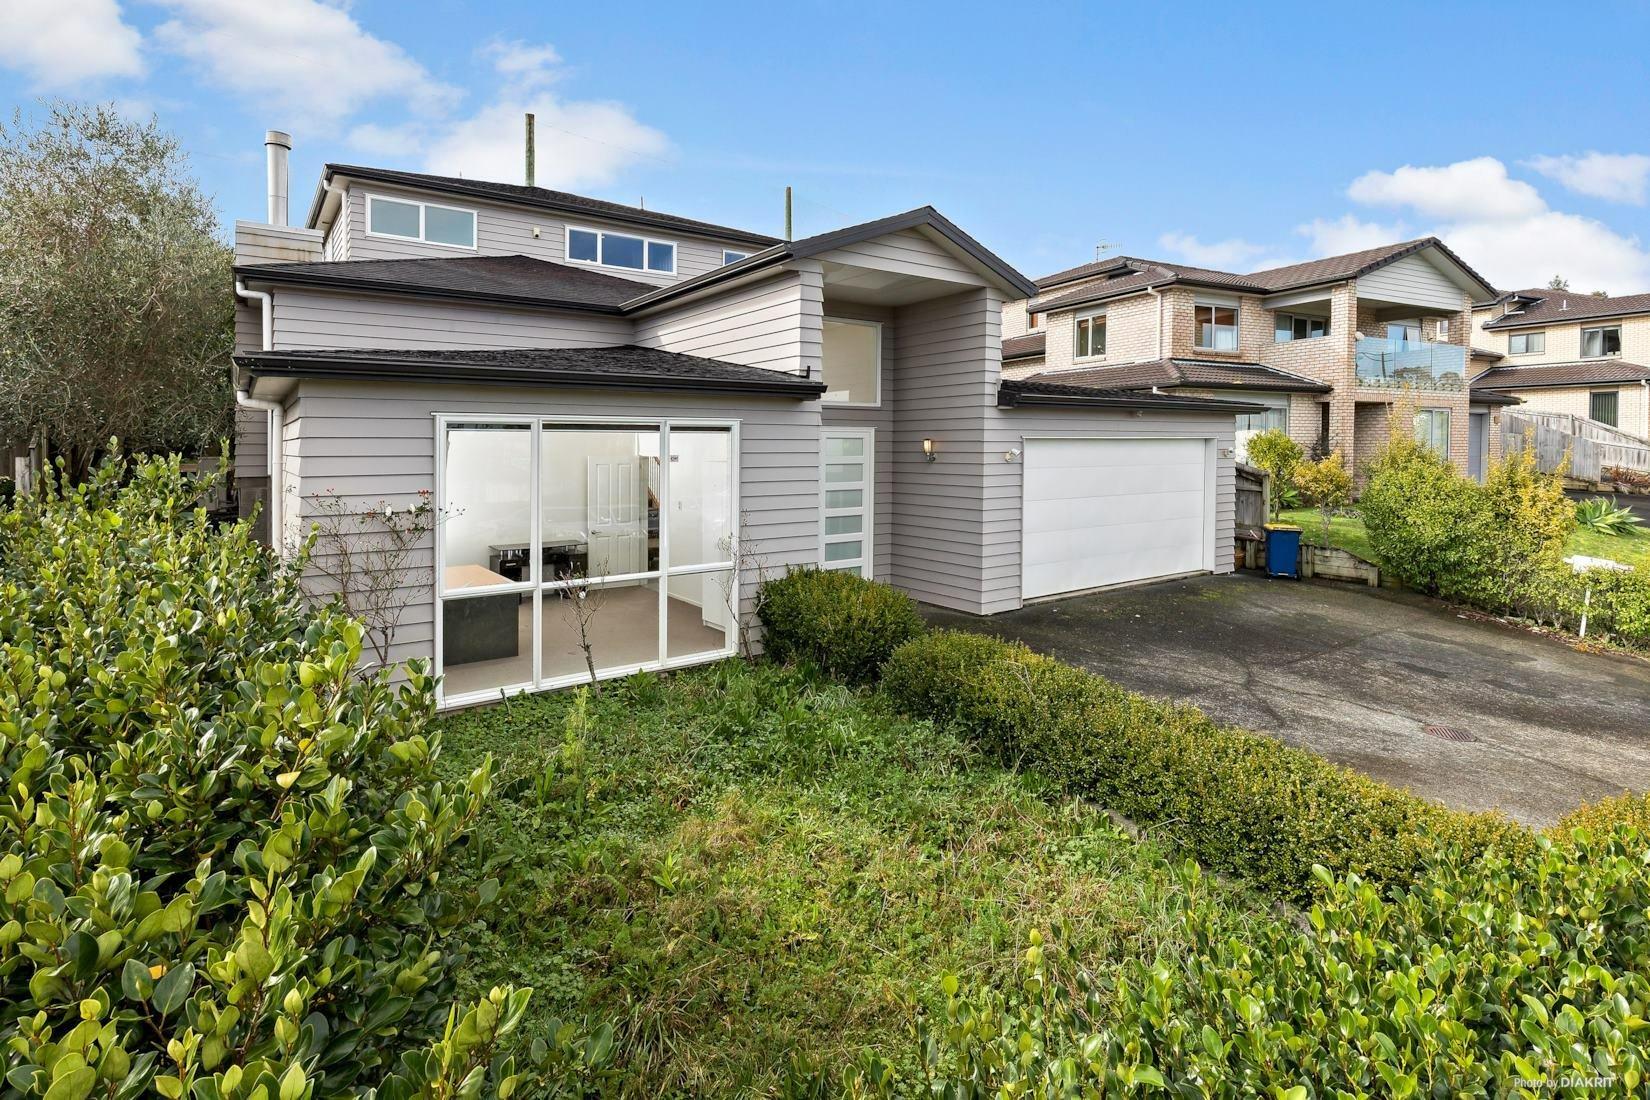 House in Schnapper Rock, Auckland, New Zealand 1